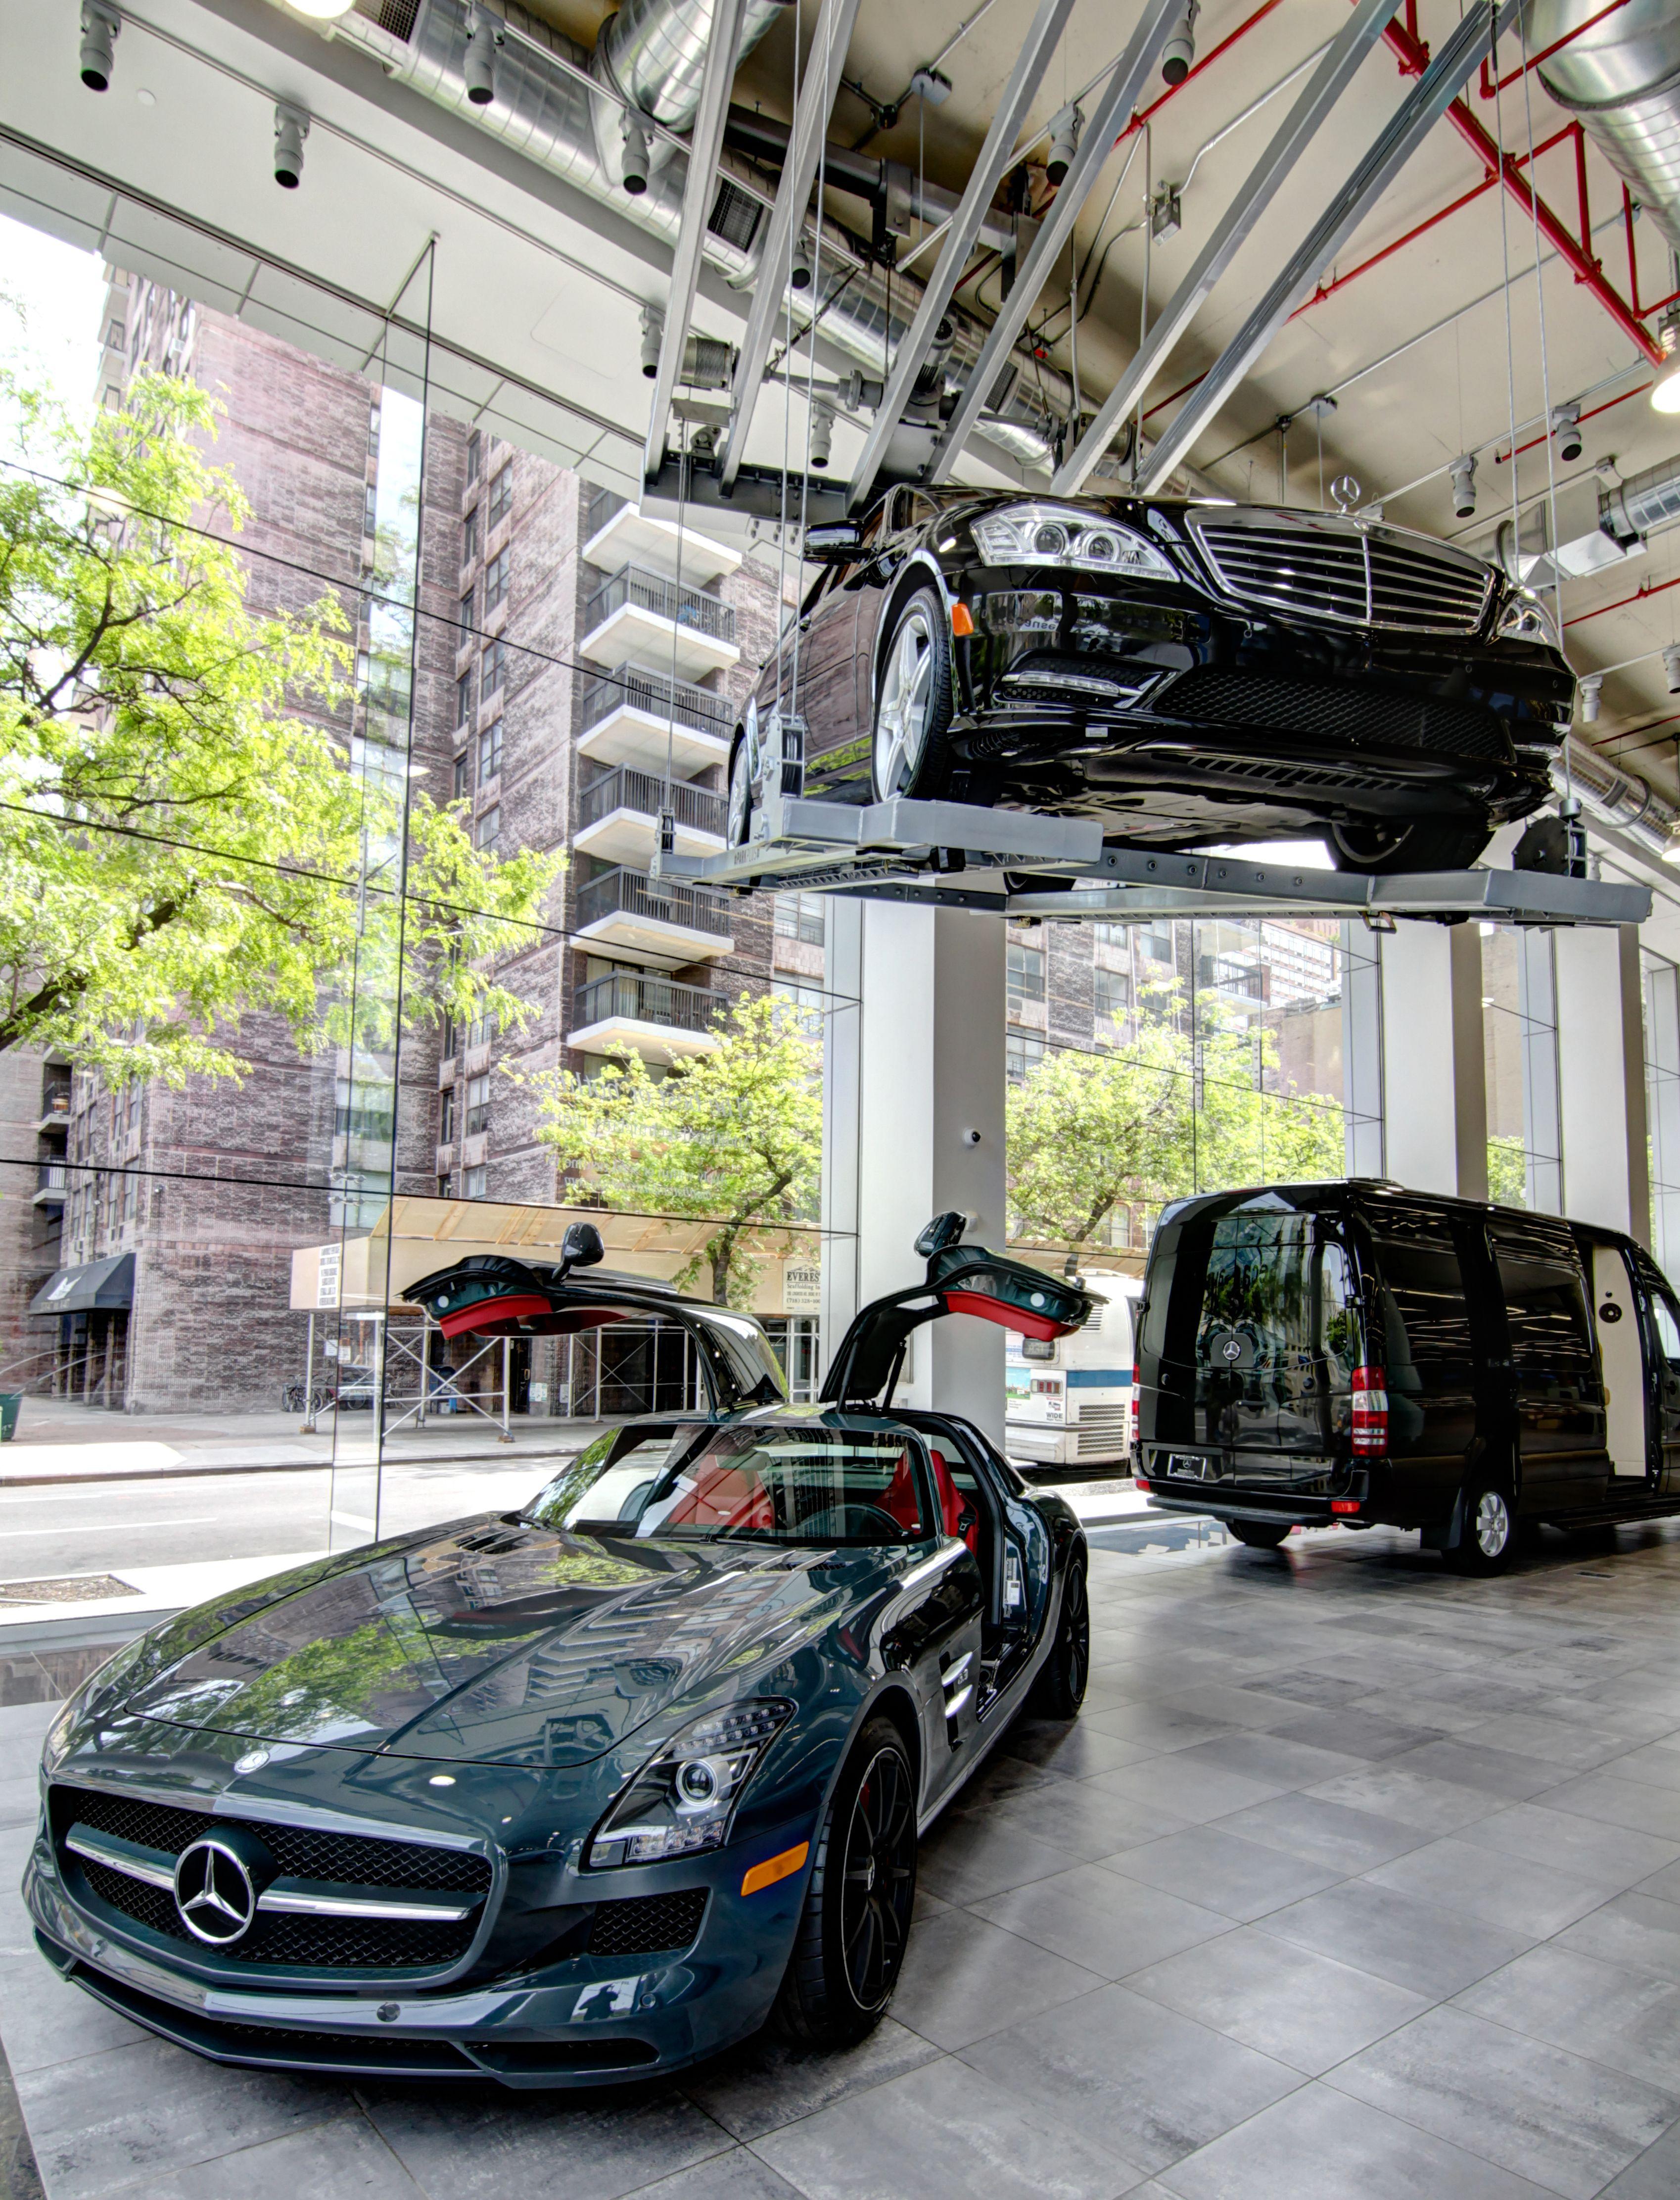 Mercedes Benz SLS AMG, S550, And Sprinter Grand Edition At Mercedes Benz  Manhattan